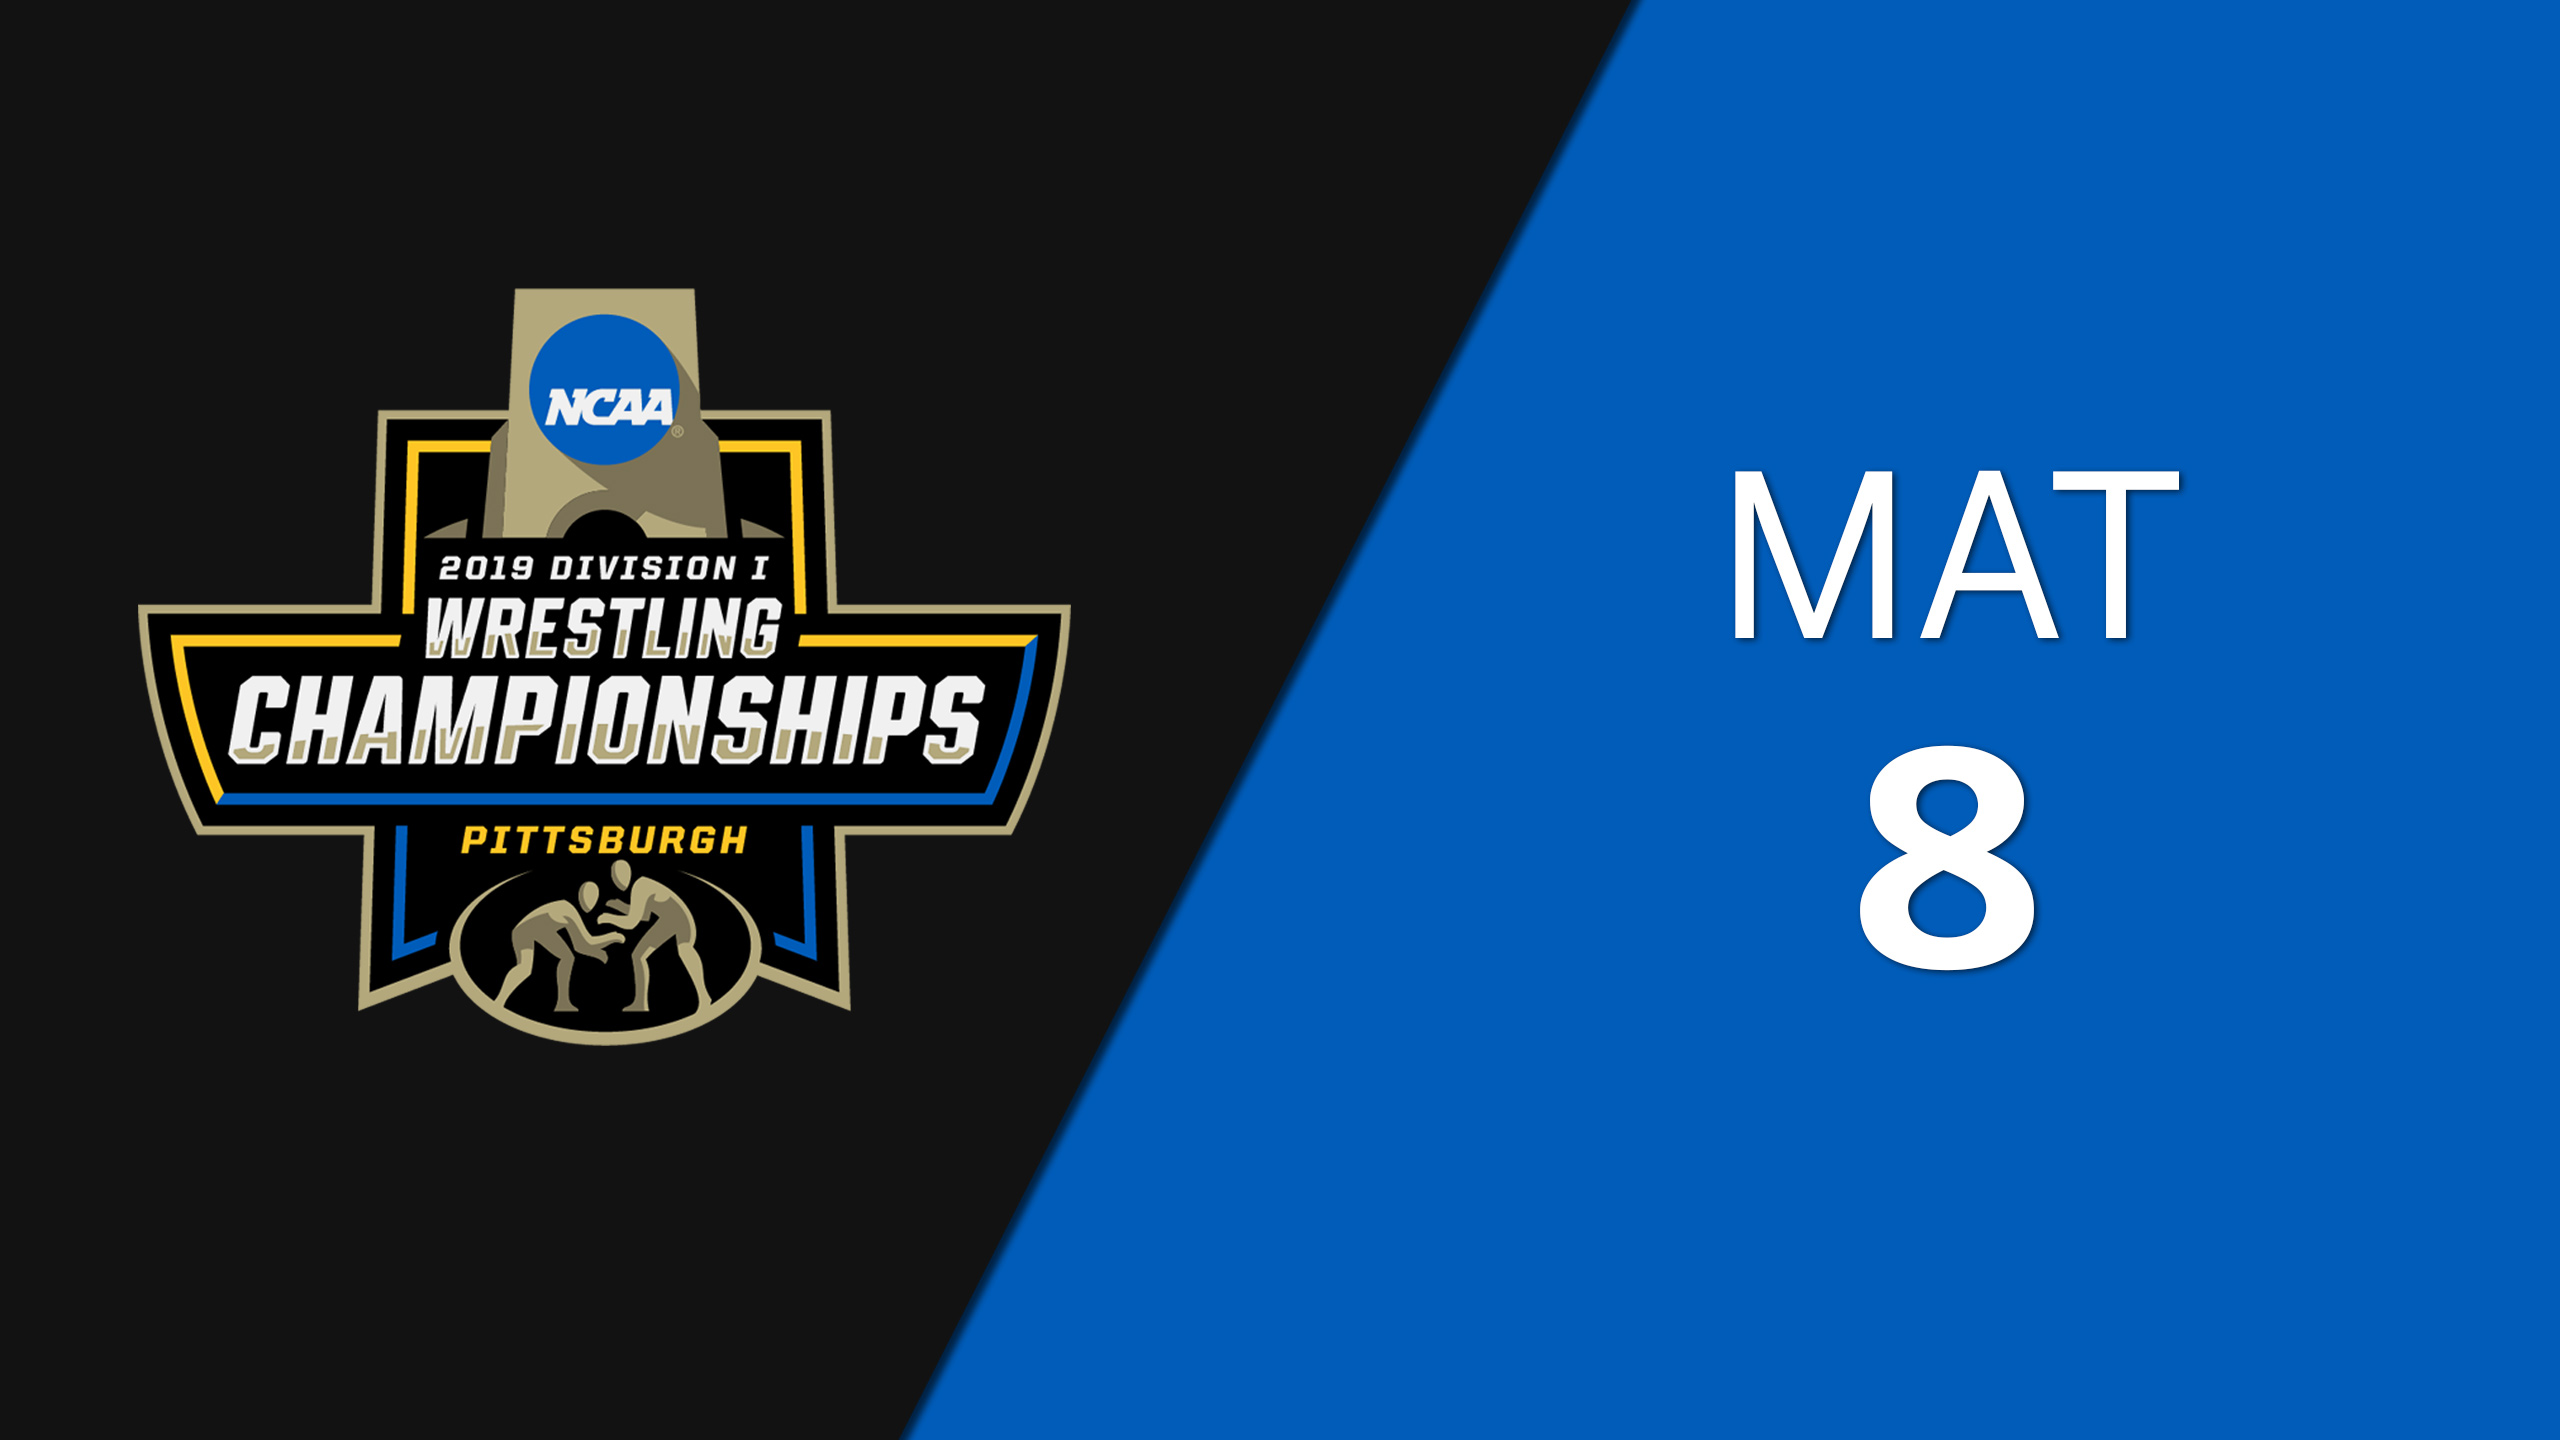 NCAA Wrestling Championship (Mat 8, Quarterfinals)